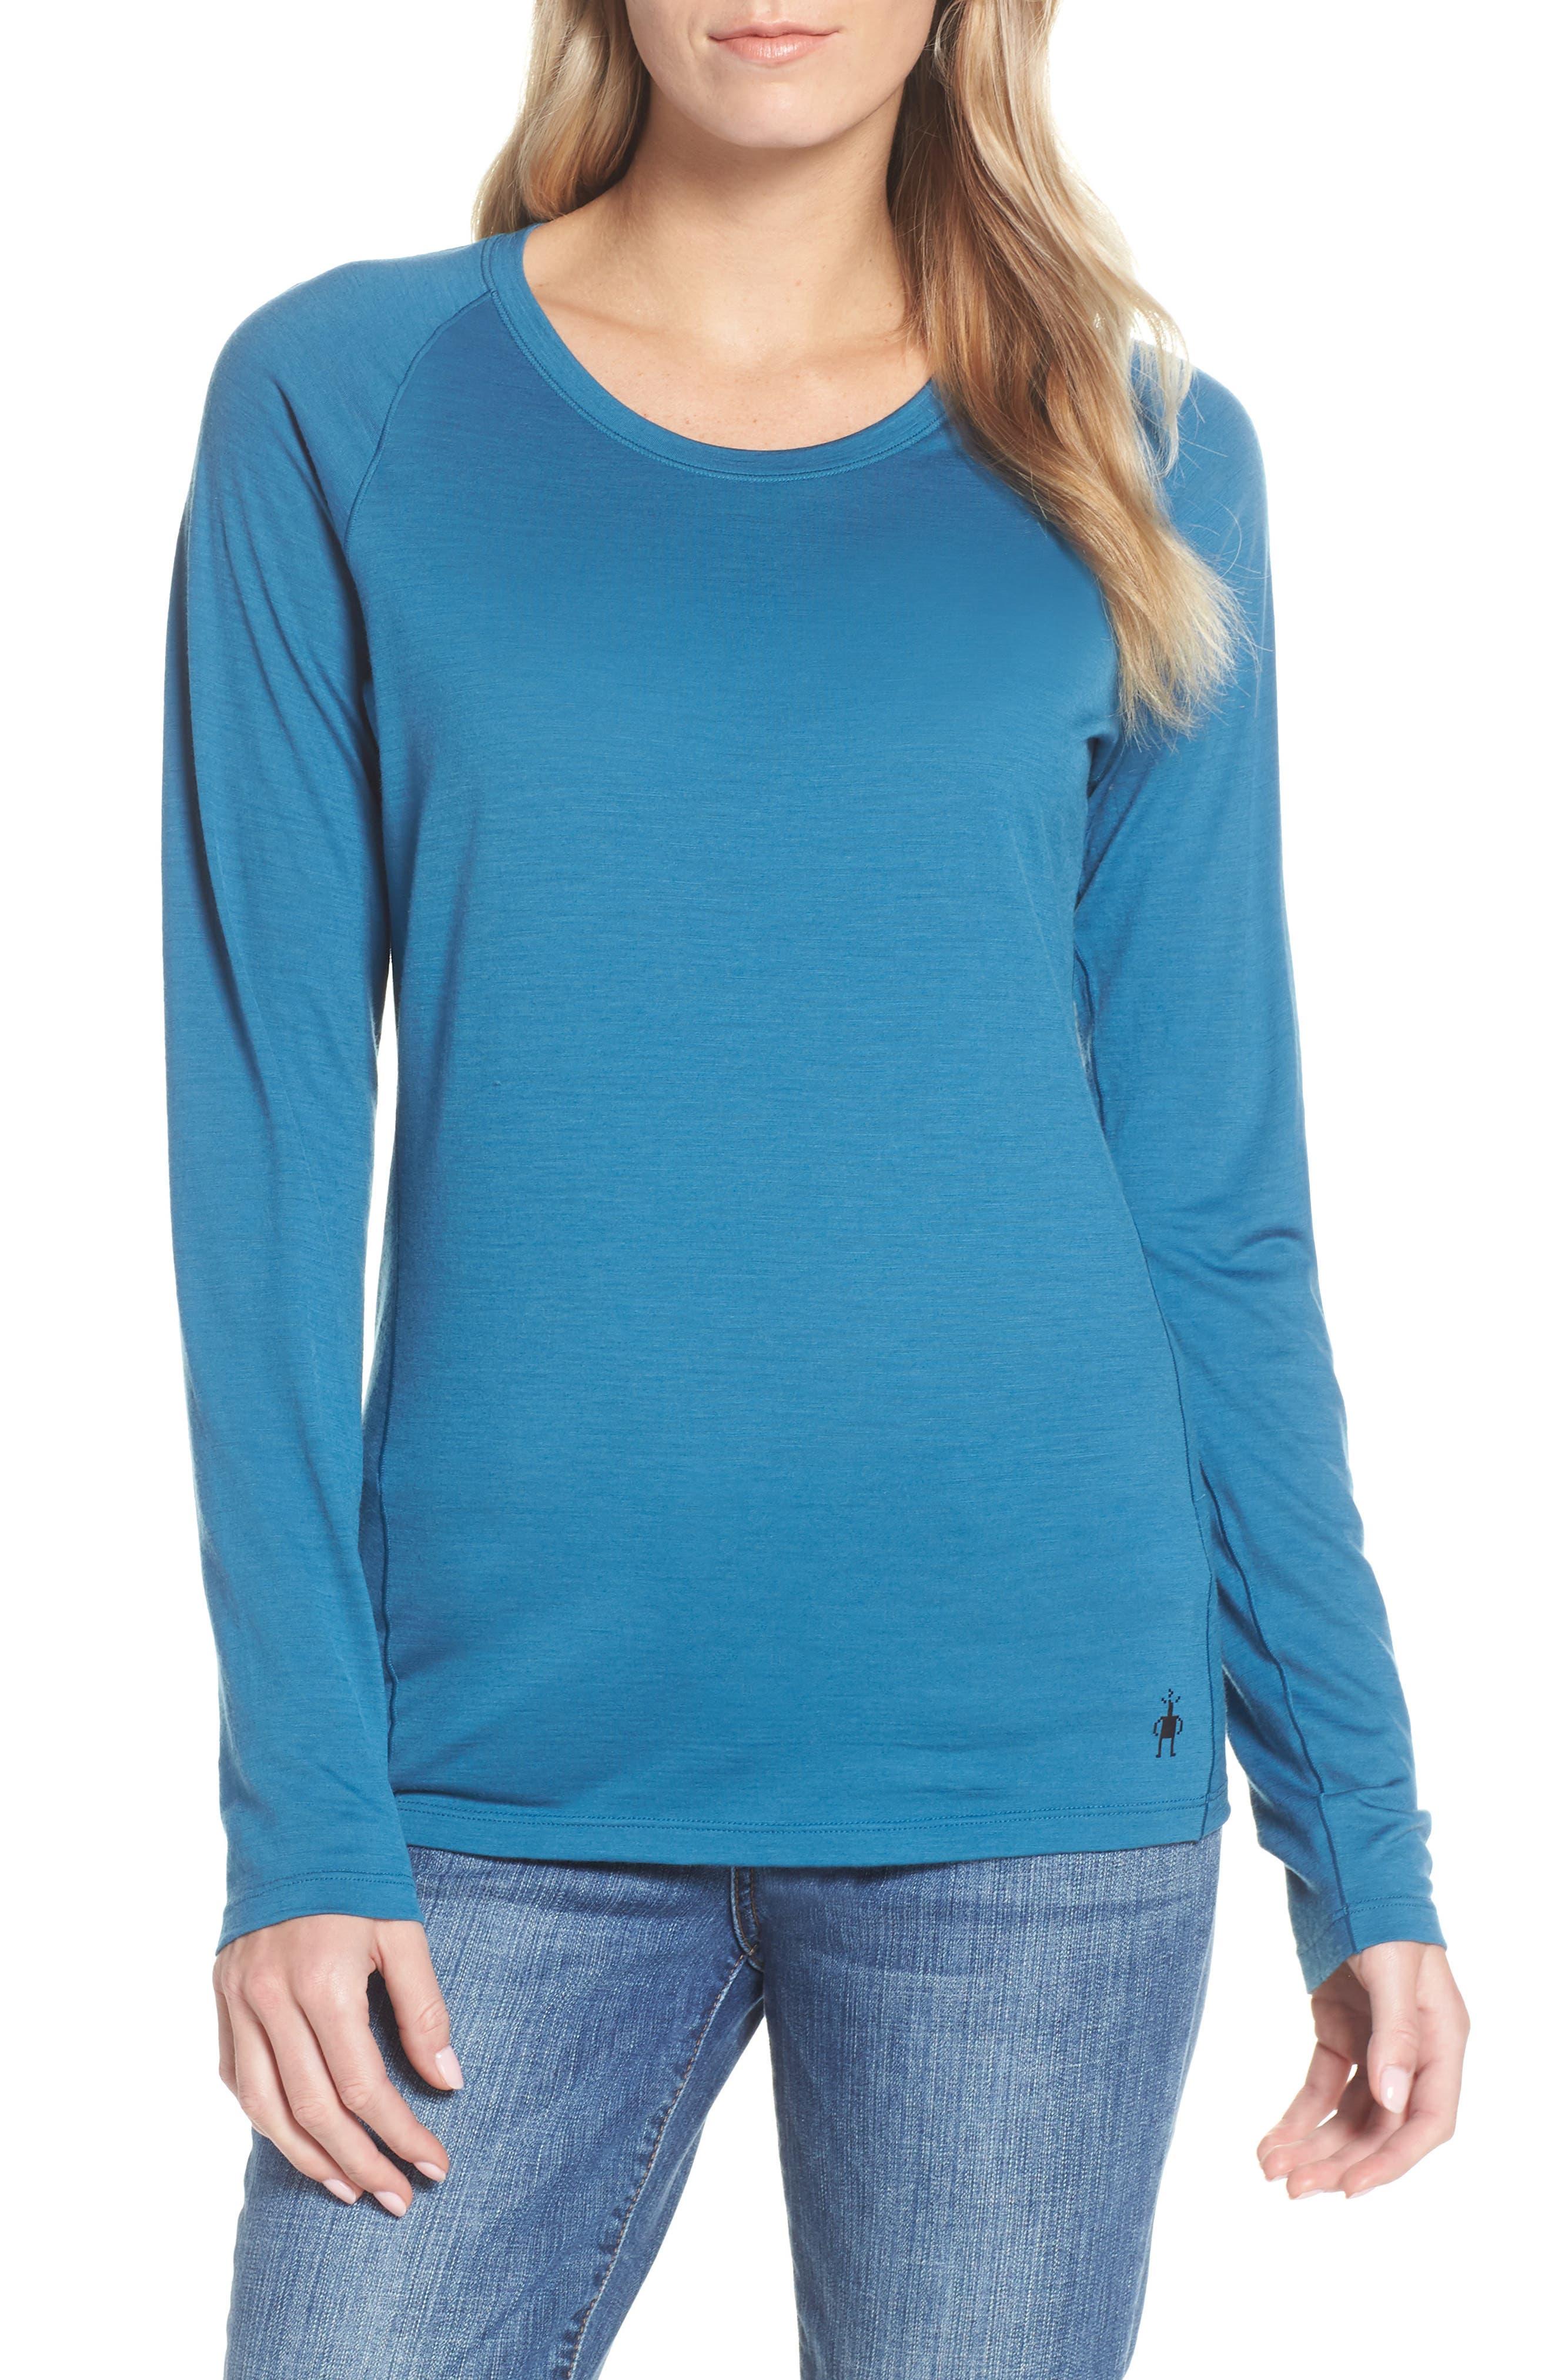 Smartwool Merino Wool 150 Base Layer Top, Blue